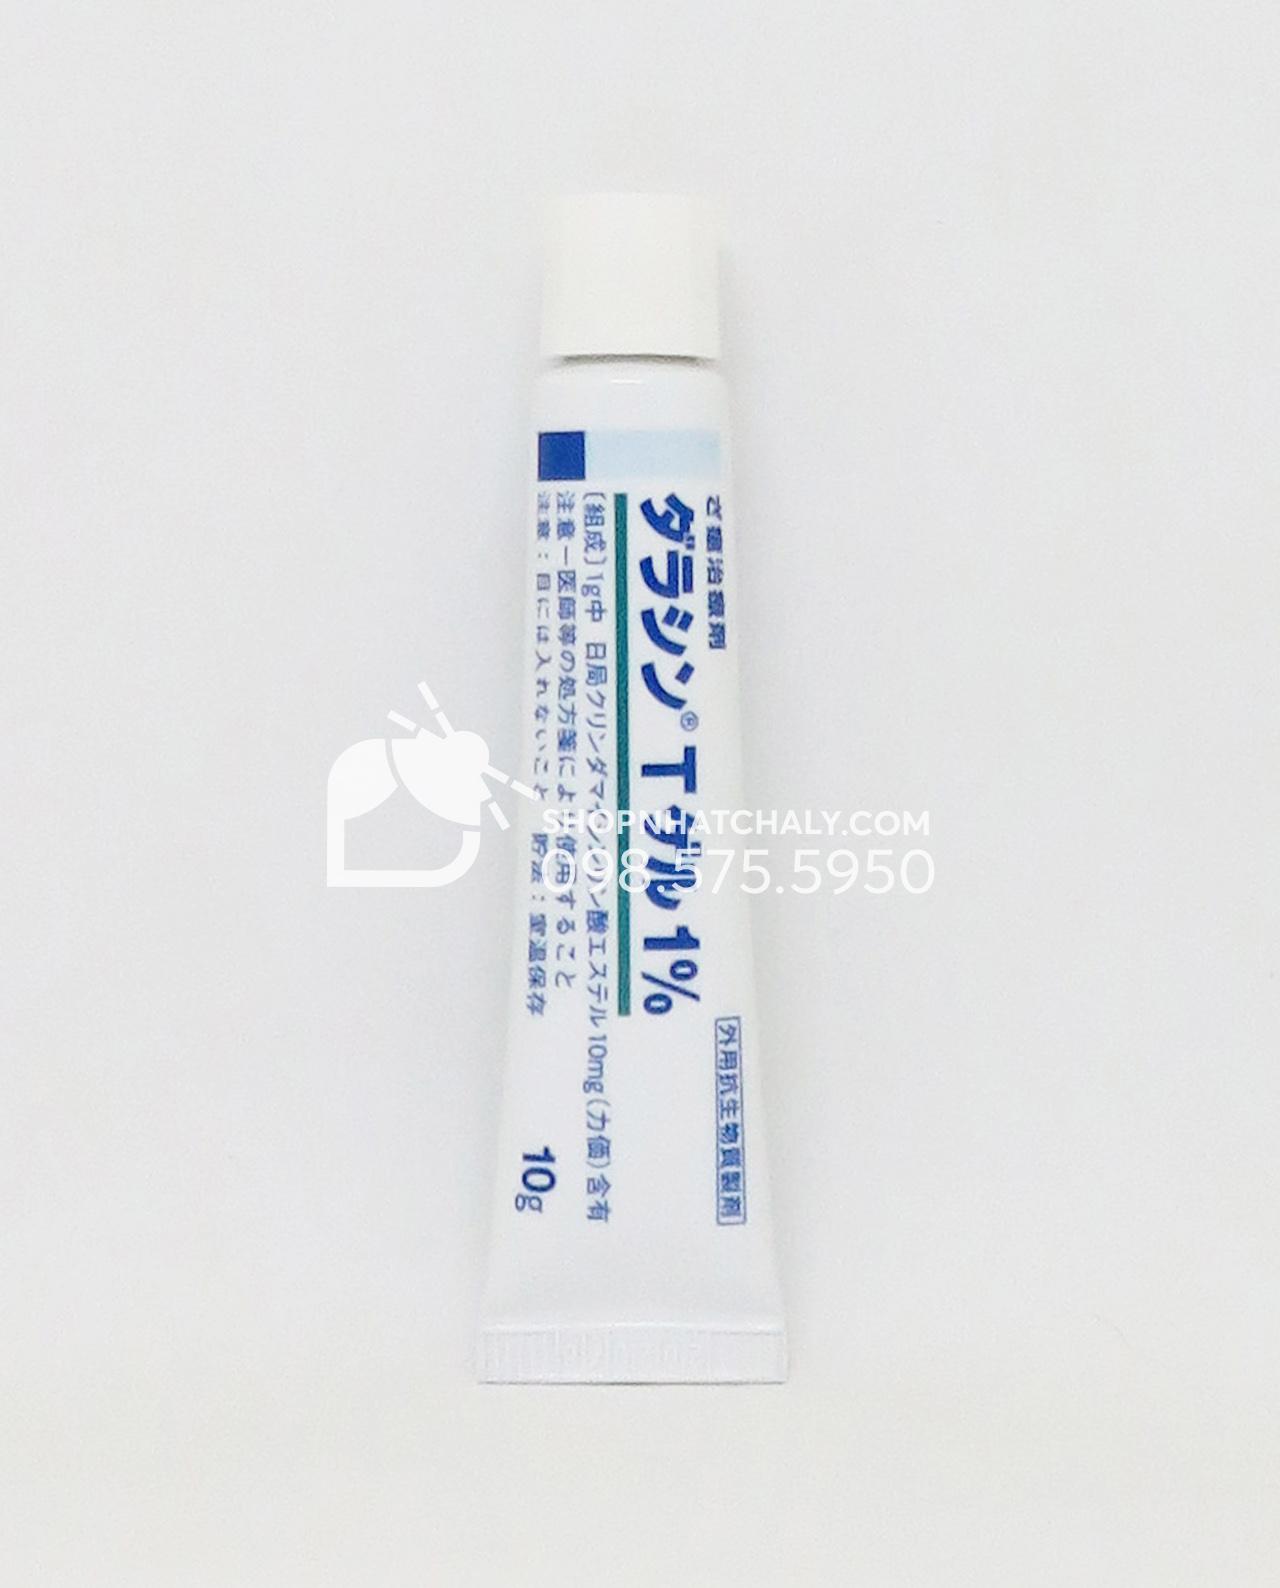 Kem đặc trị mụn Dalacin T Gel 1% Nhật Bản